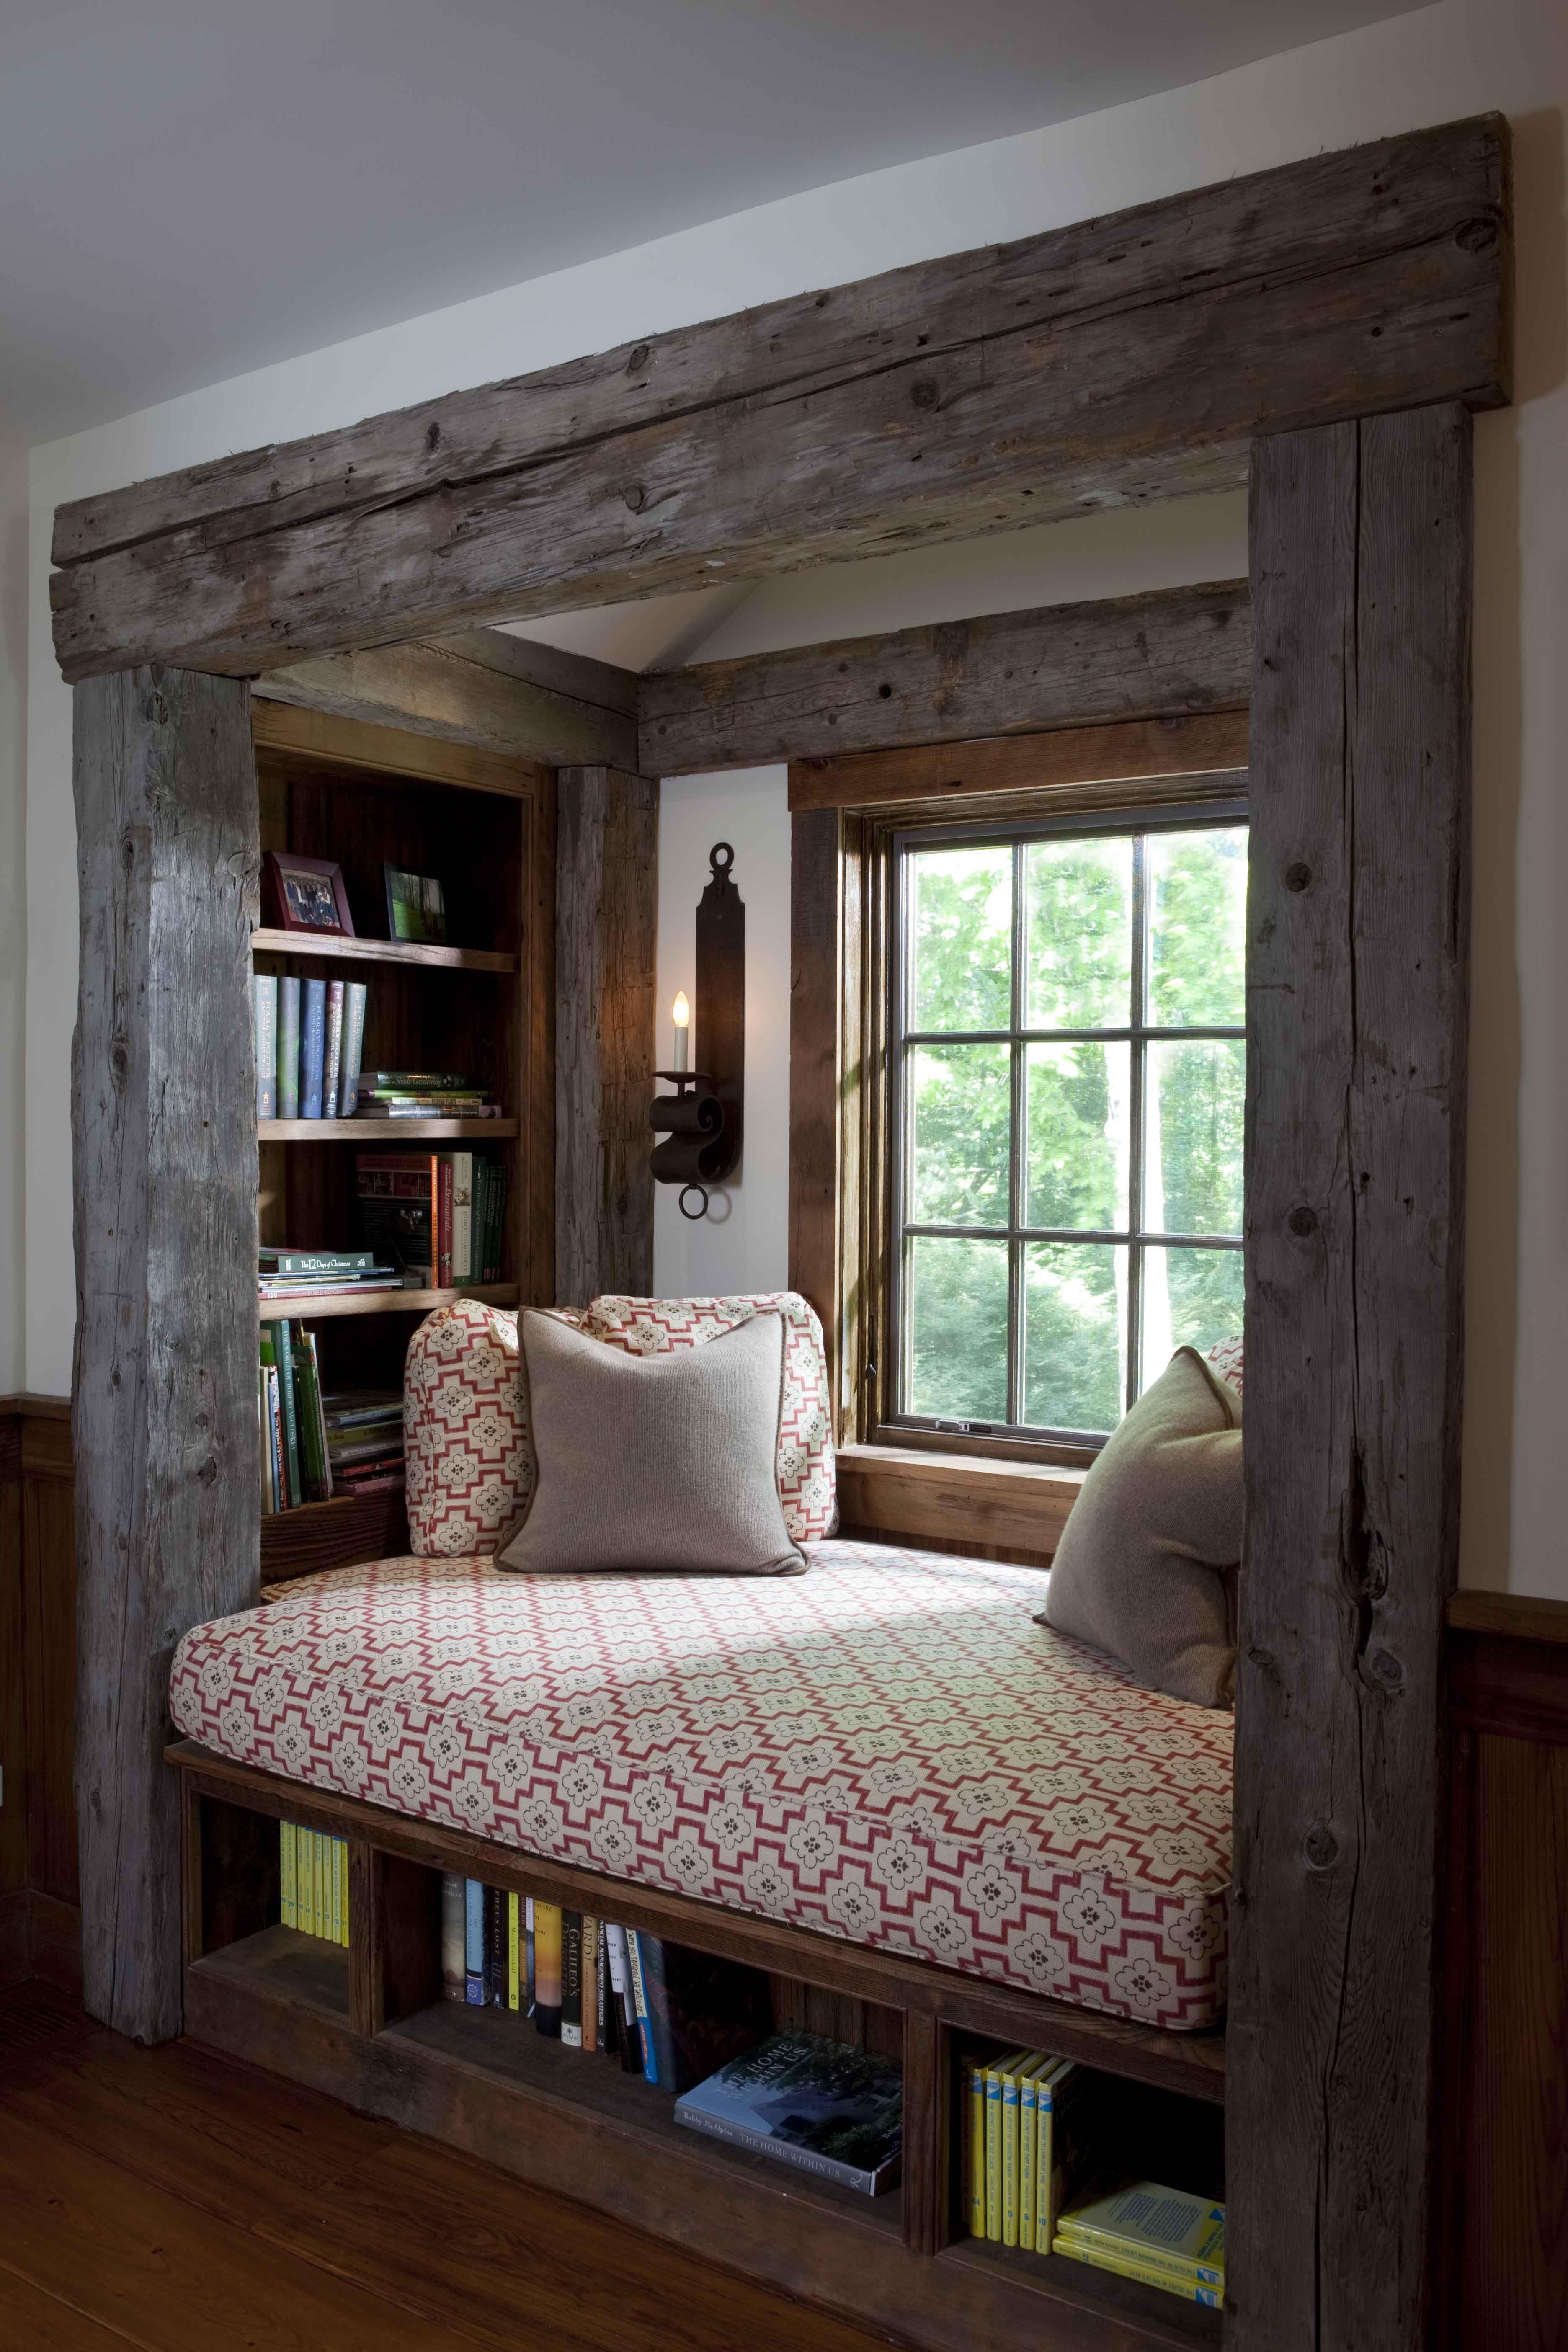 Kitchen window from outside  brooks and falotico associates  book shelf  pinterest  fairfield